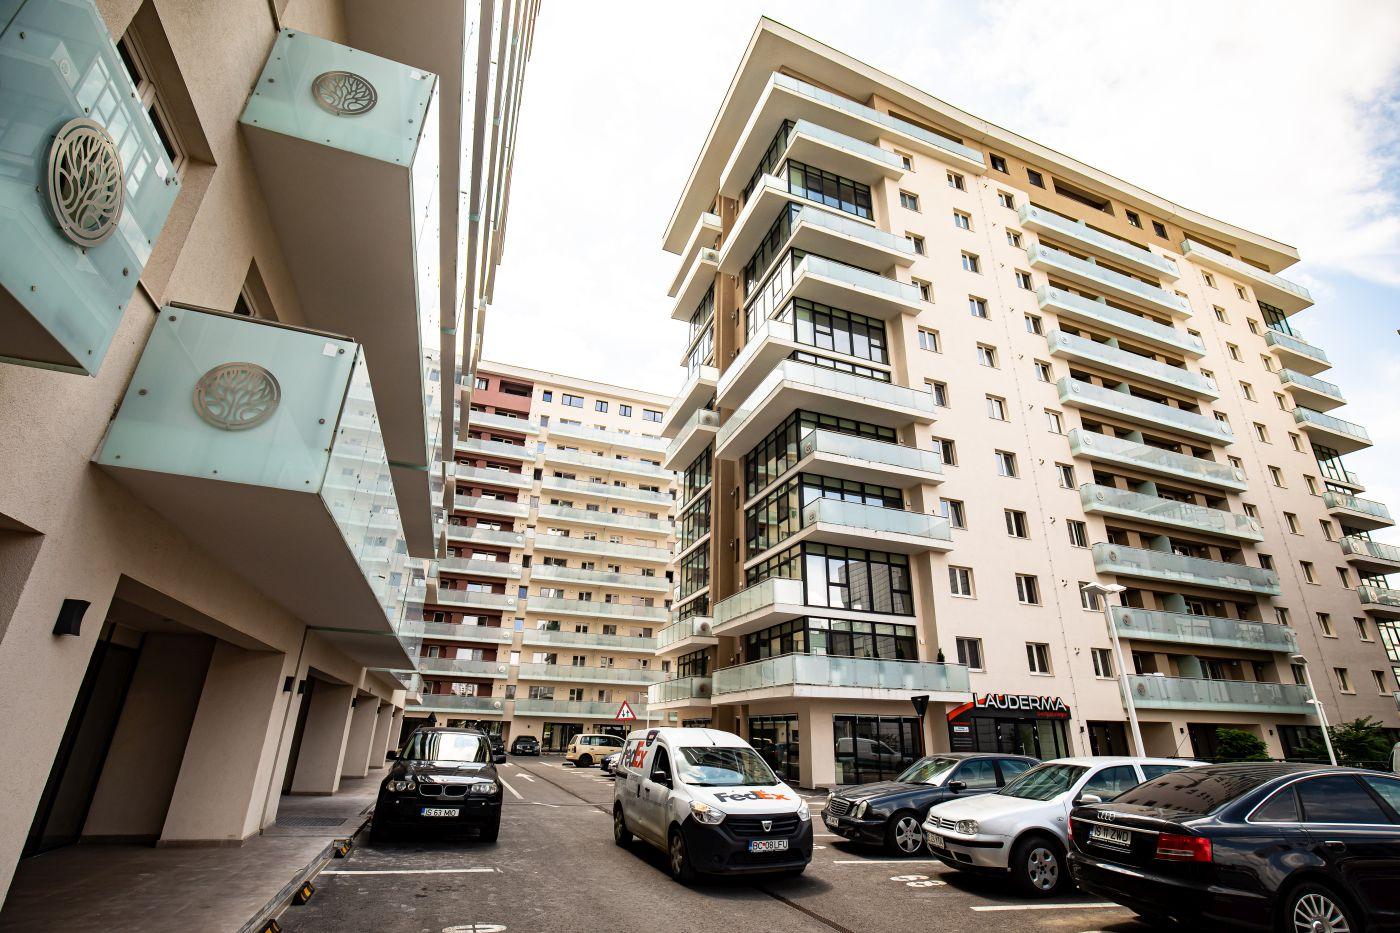 conest-grand-residence-spatii-comerciale-de-inchiriat-iasi-cgr-11